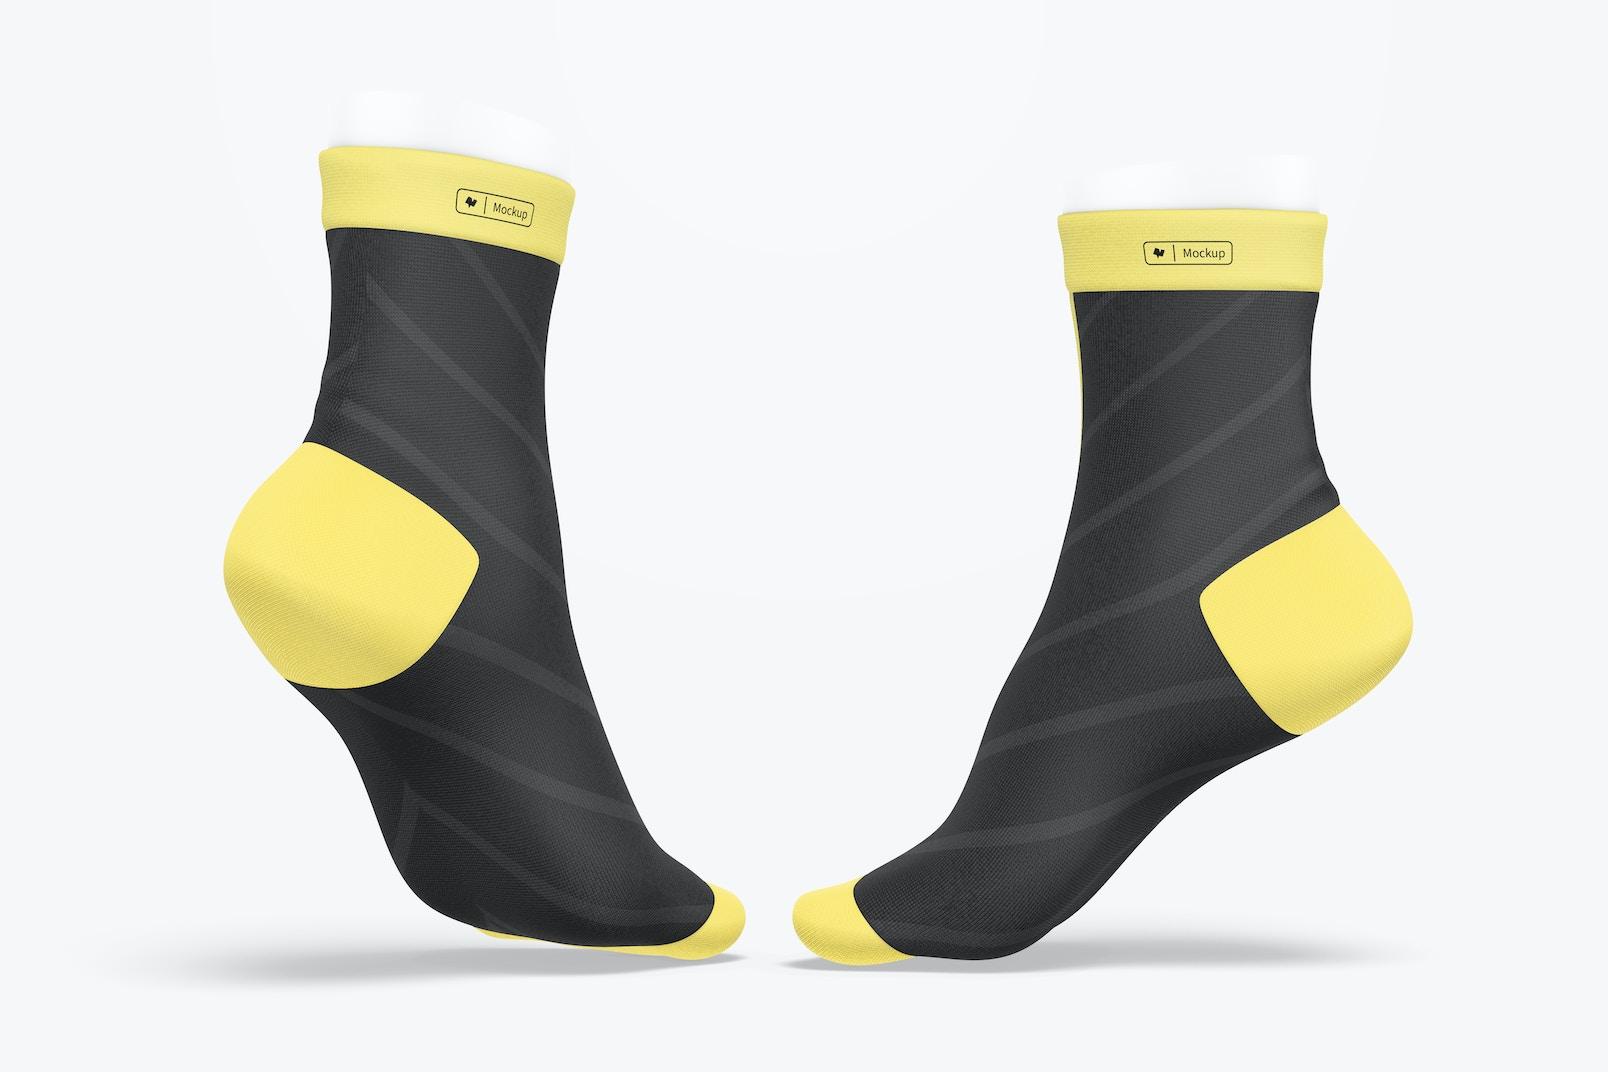 Sports Cycling Socks Mockup, Back View